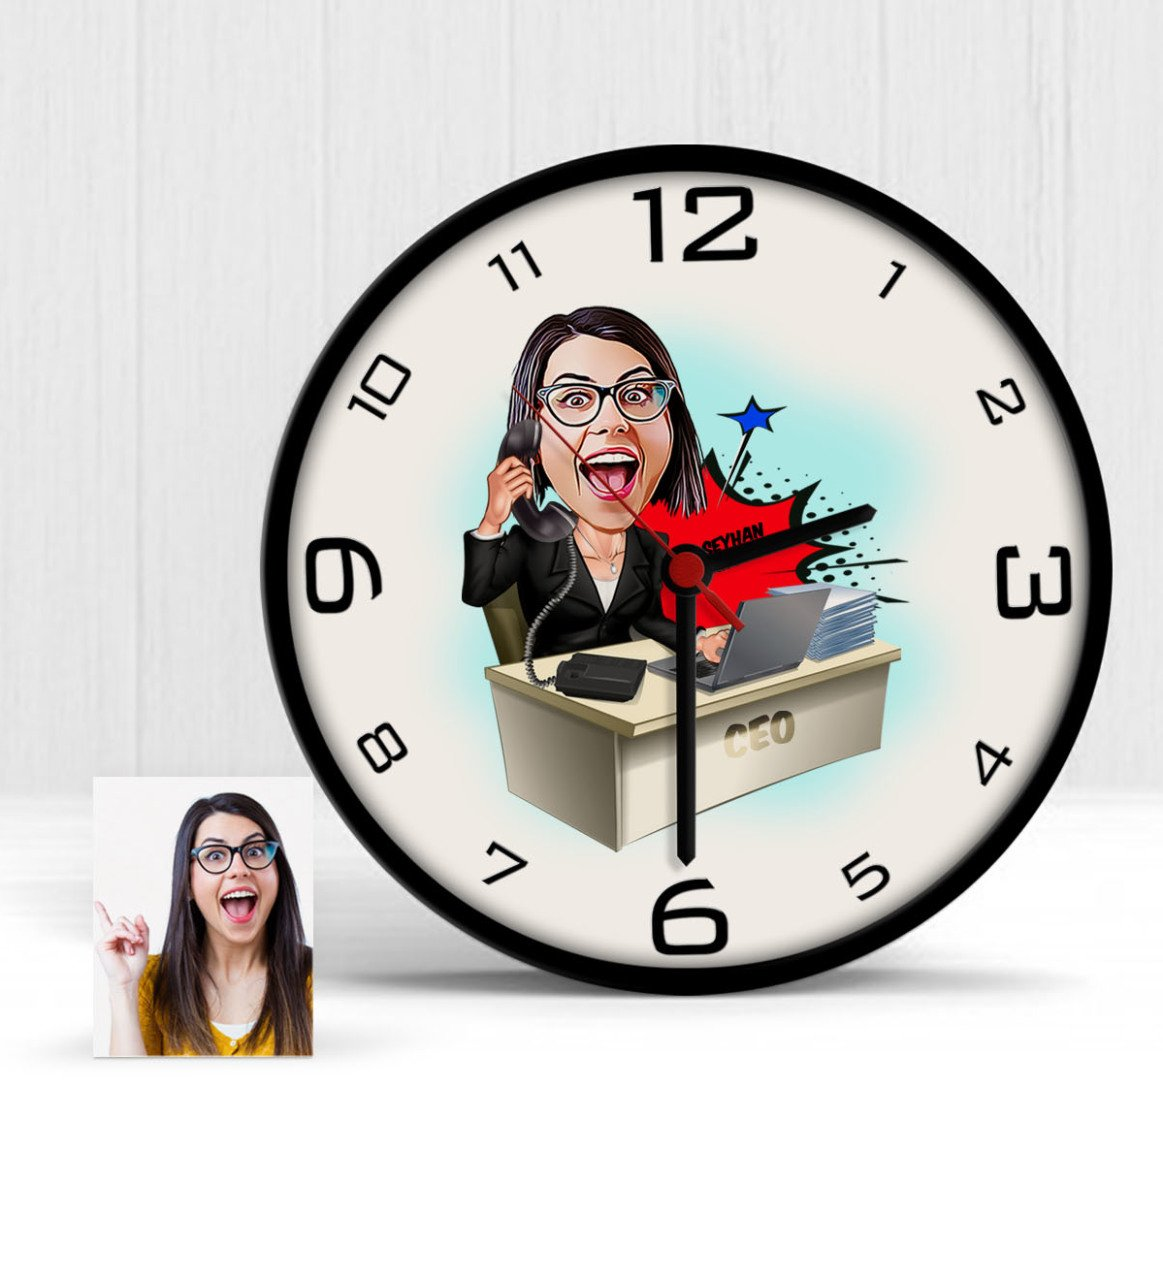 Reloj de pared de madera de dibujos animados CEO personalizado para mujer-1